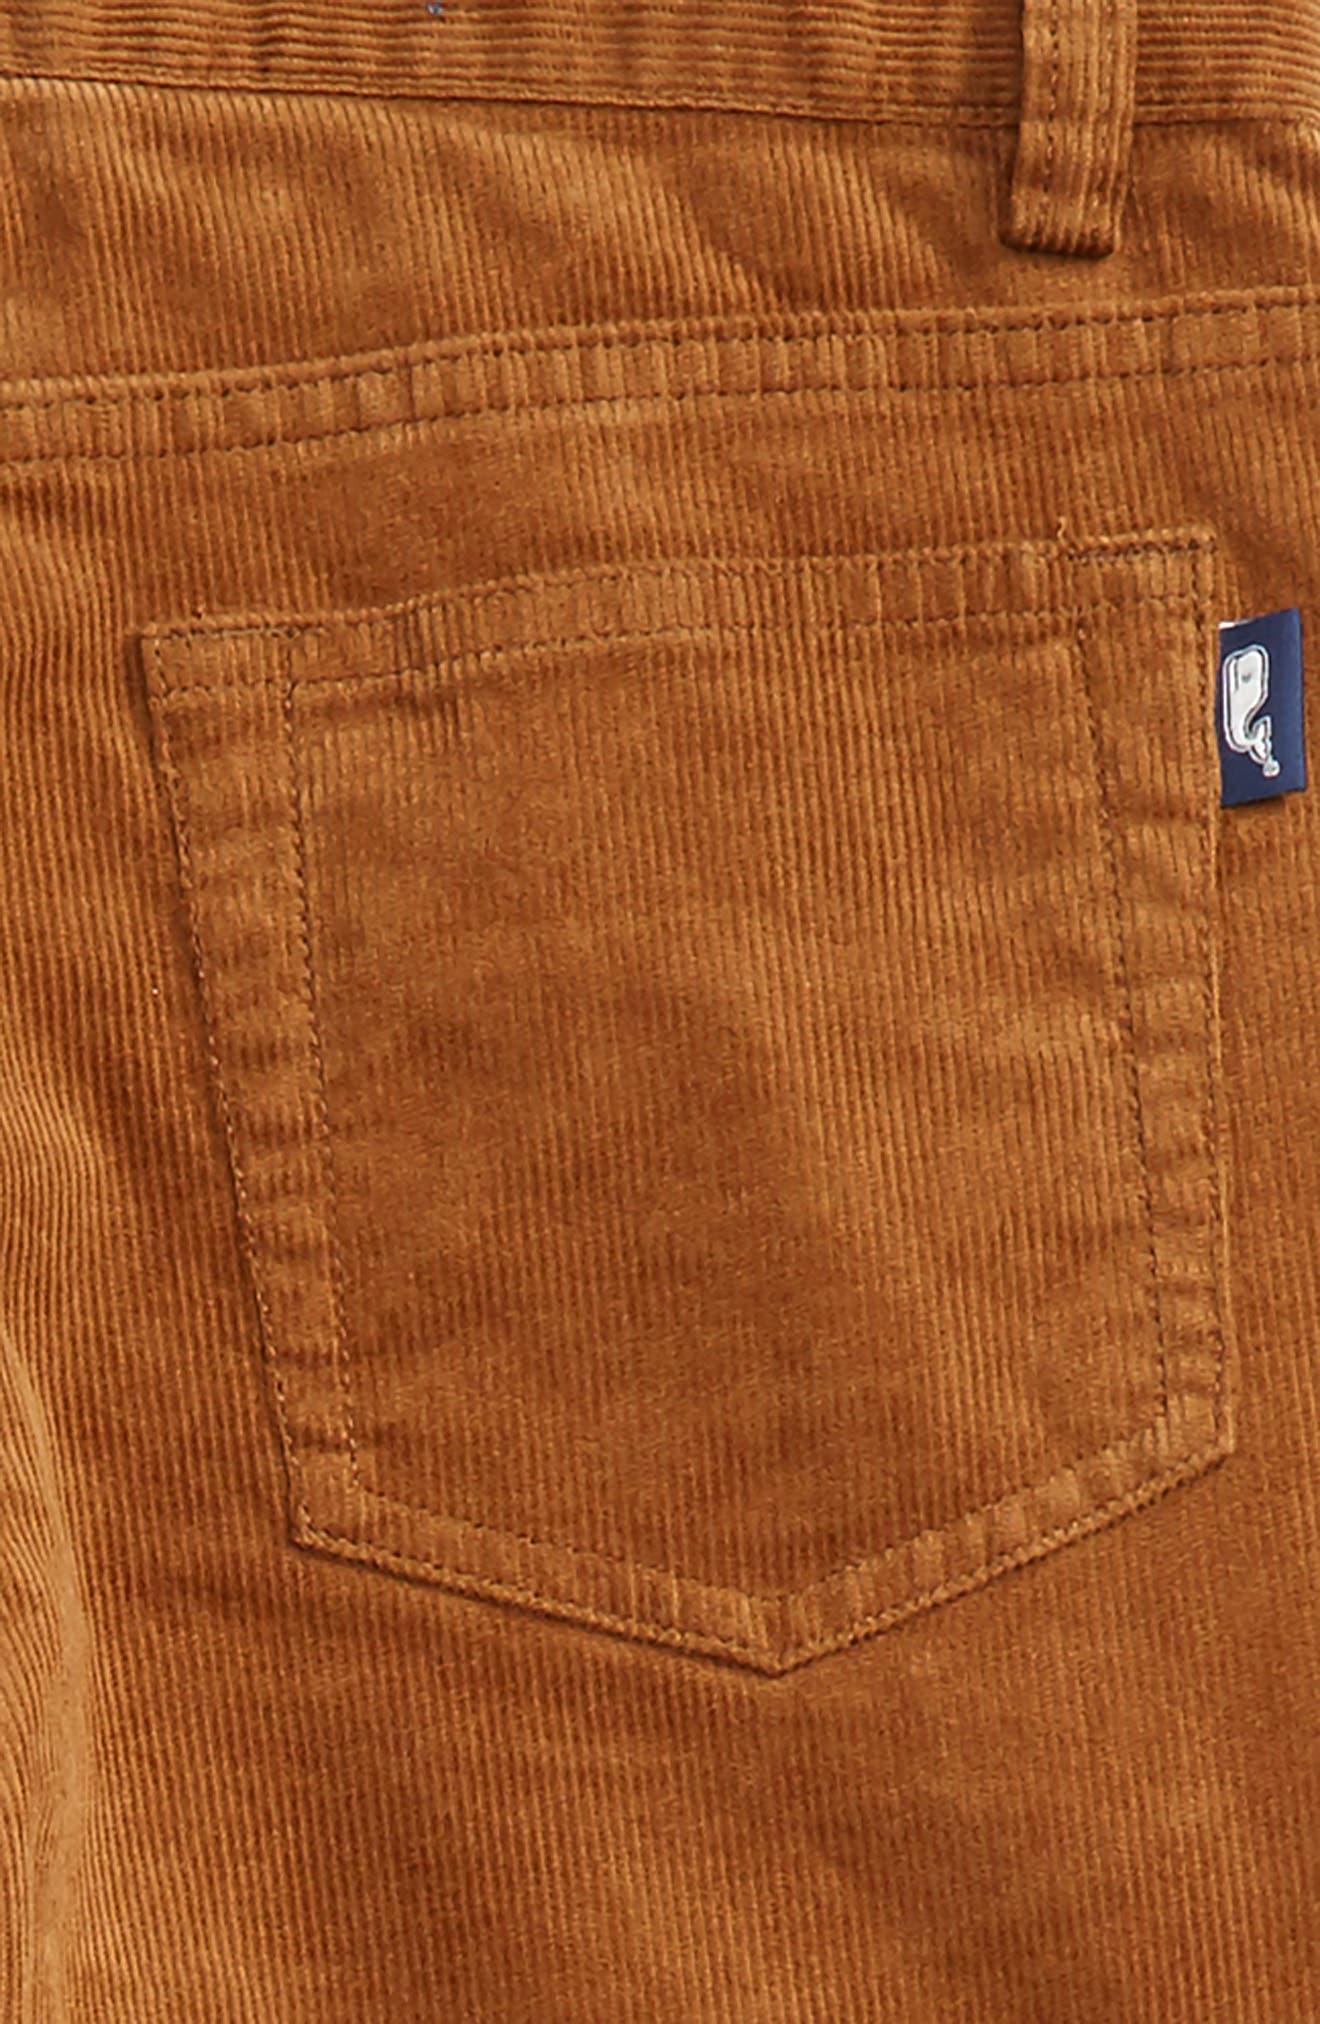 Straight Leg Corduroy Pants,                             Alternate thumbnail 10, color,